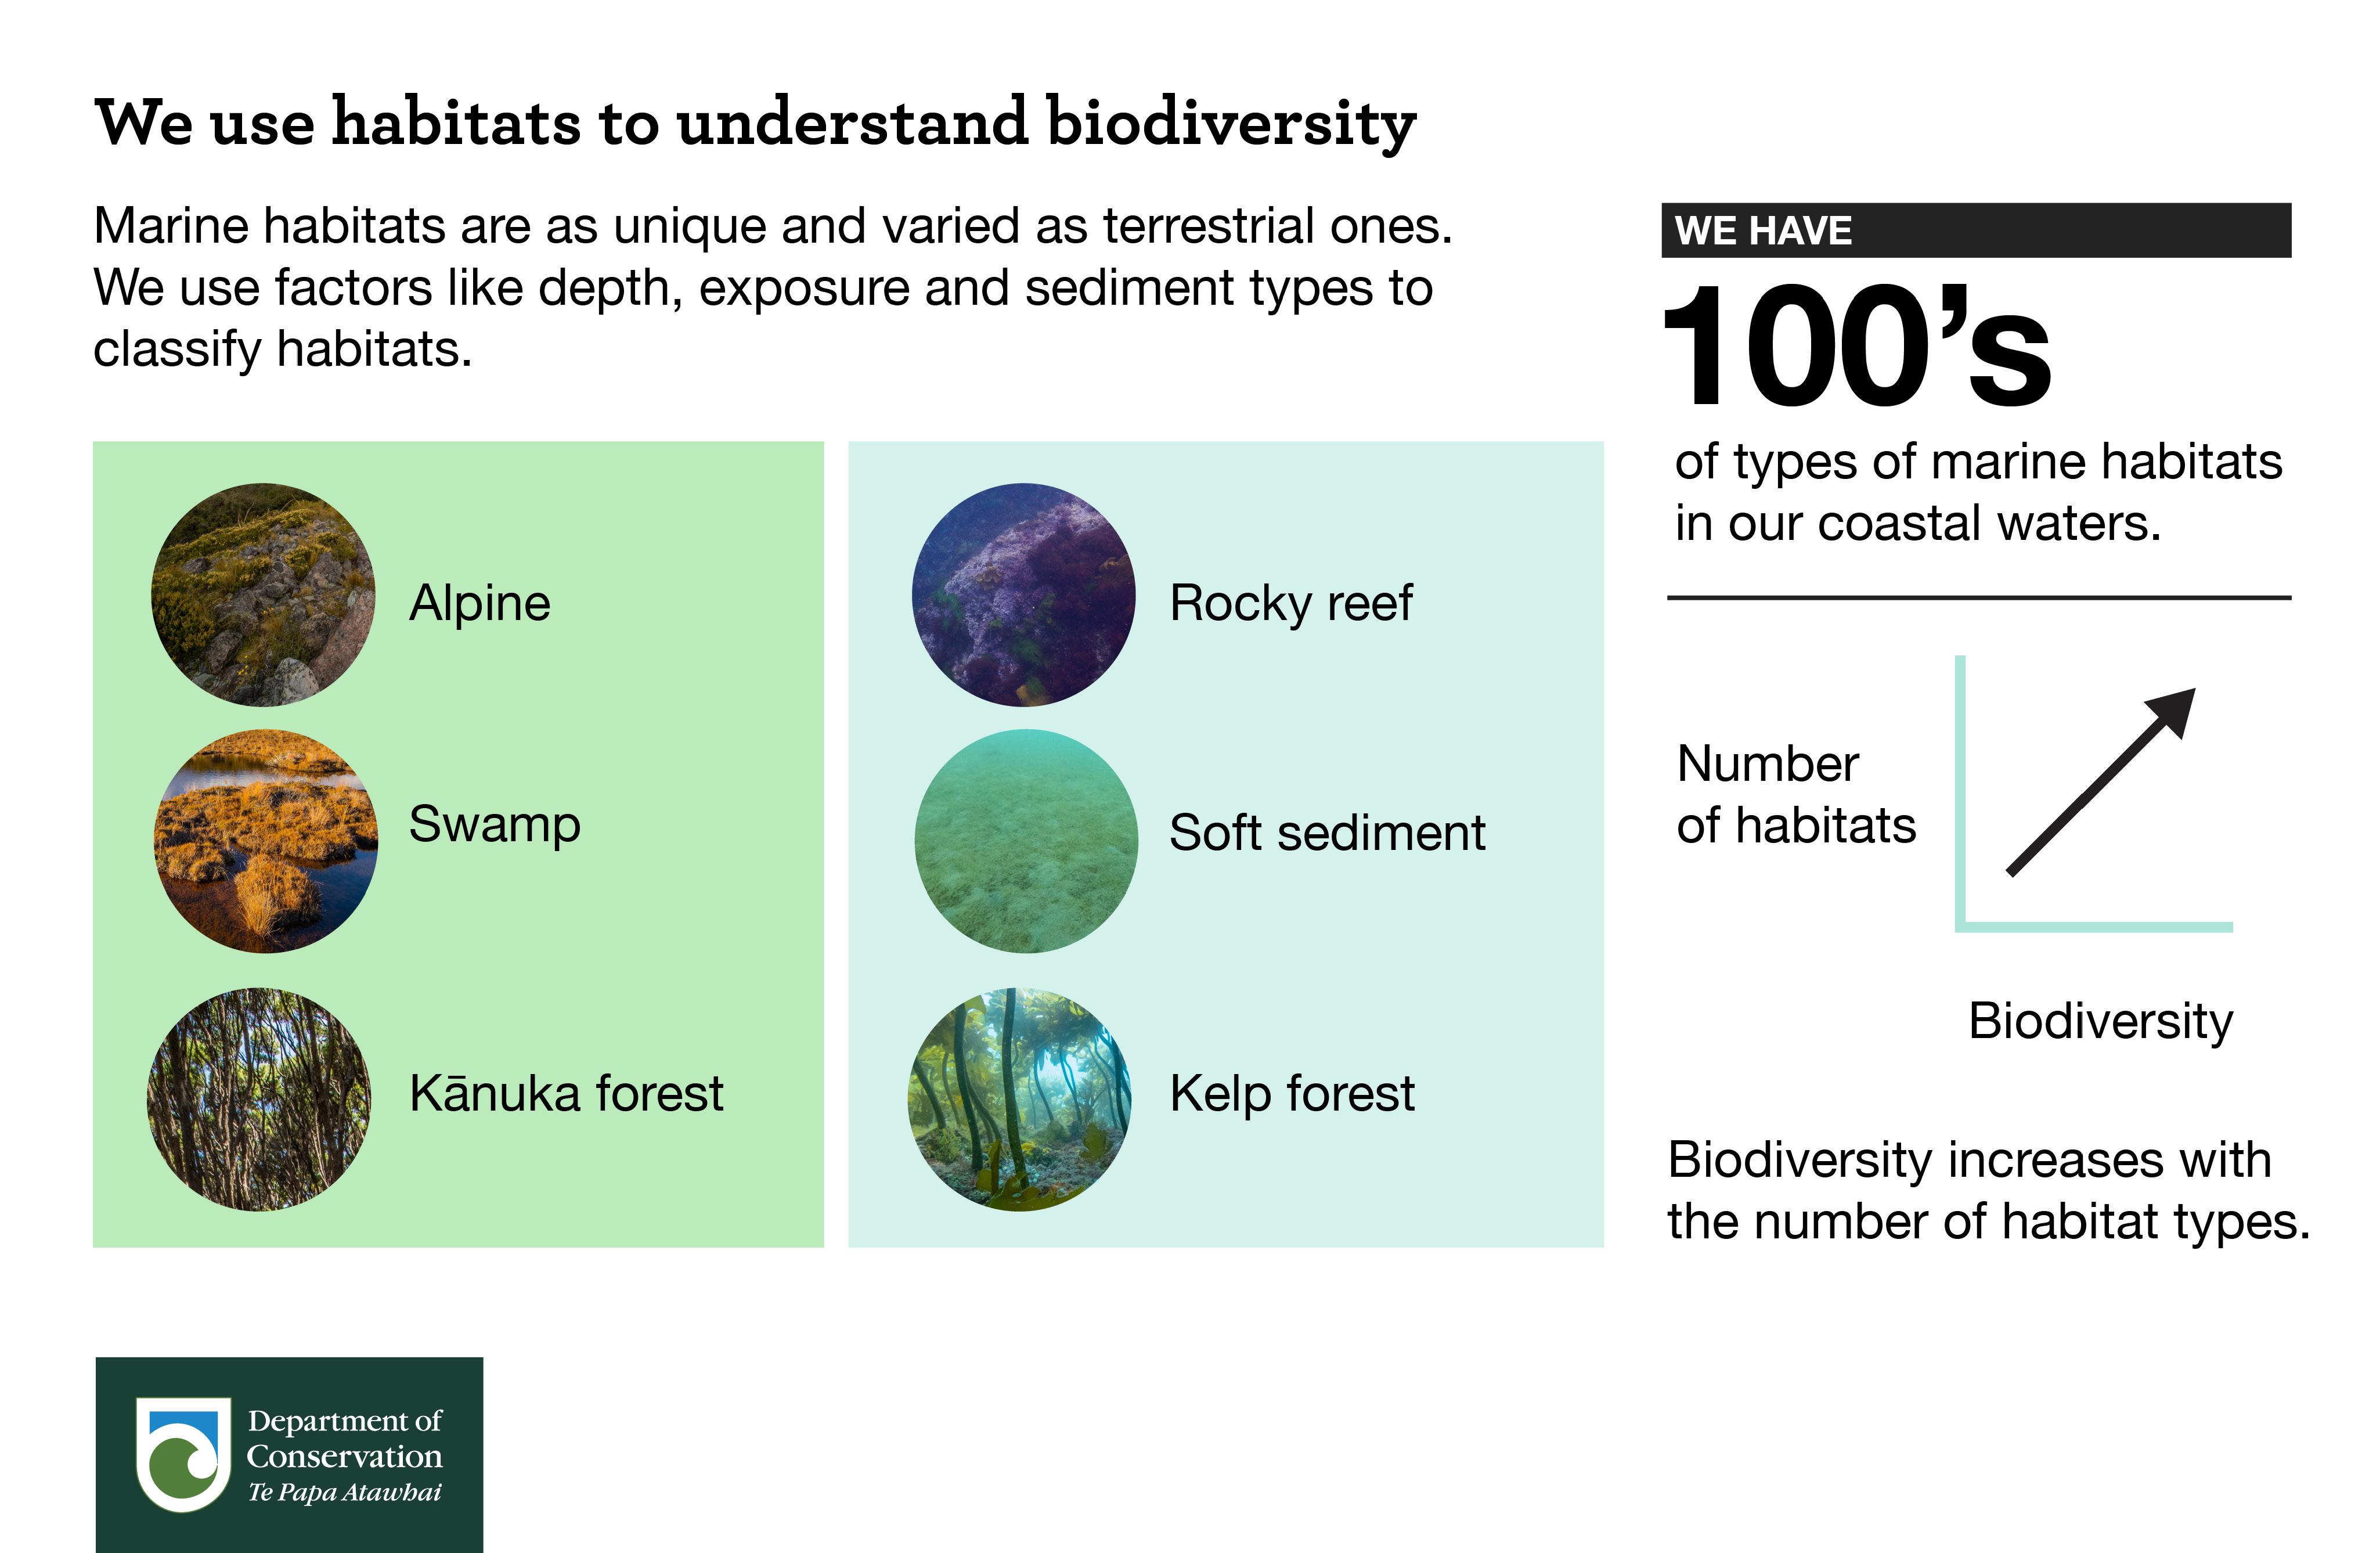 We use habitats to understand biodiversity